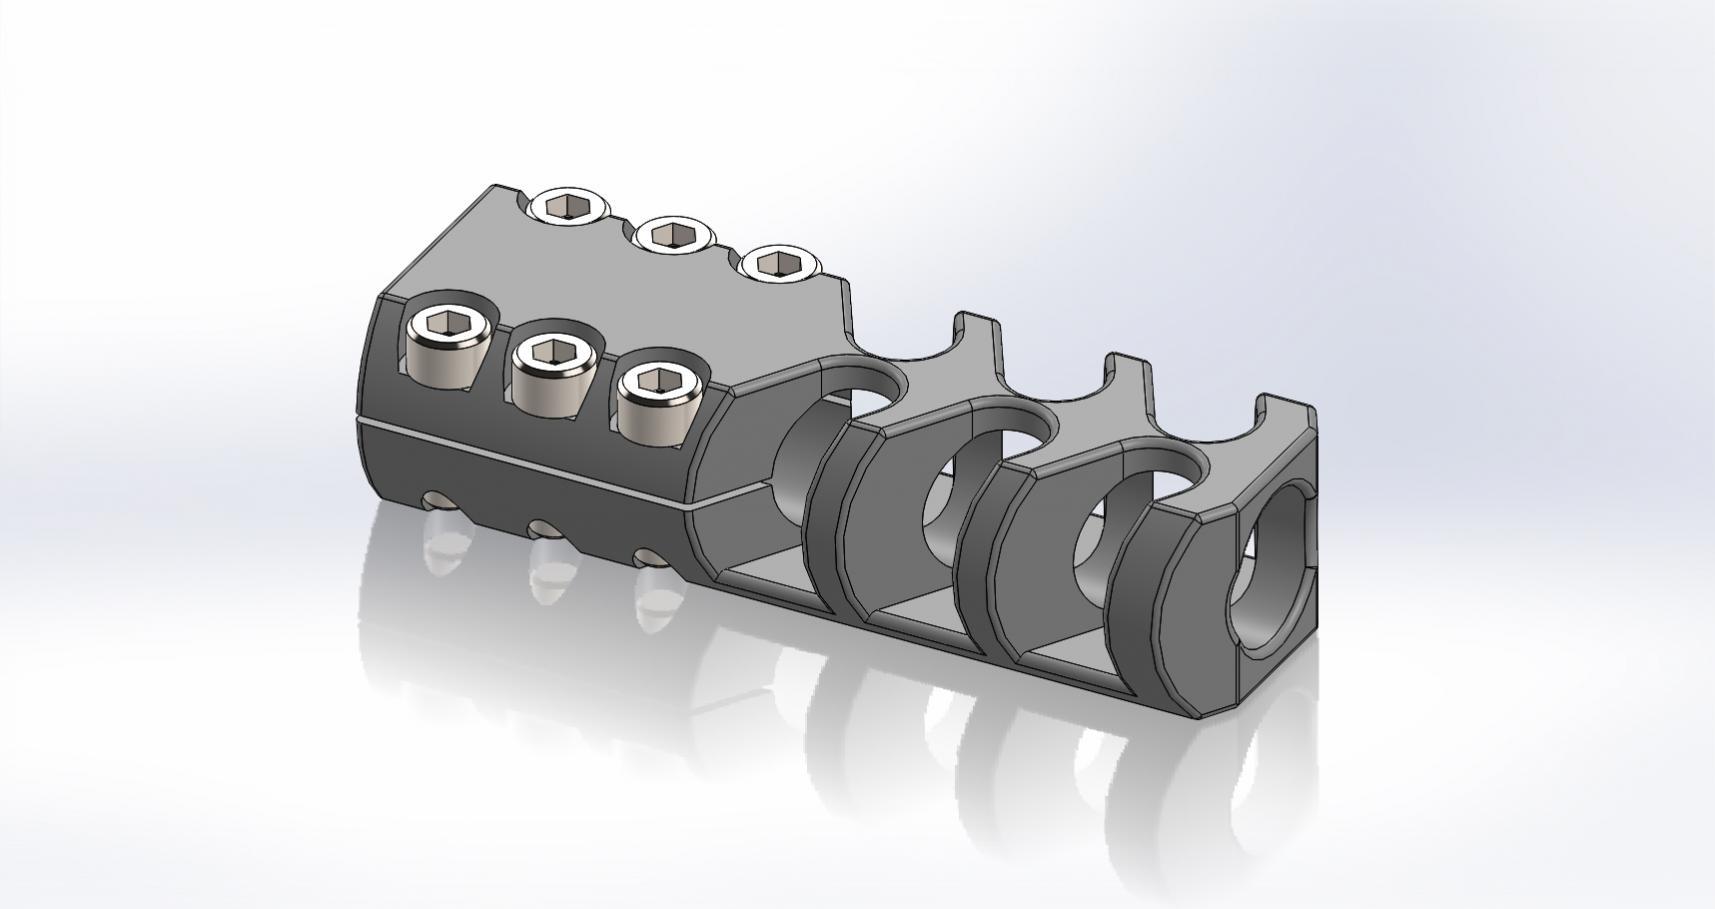 Best Muzzle Brake Design